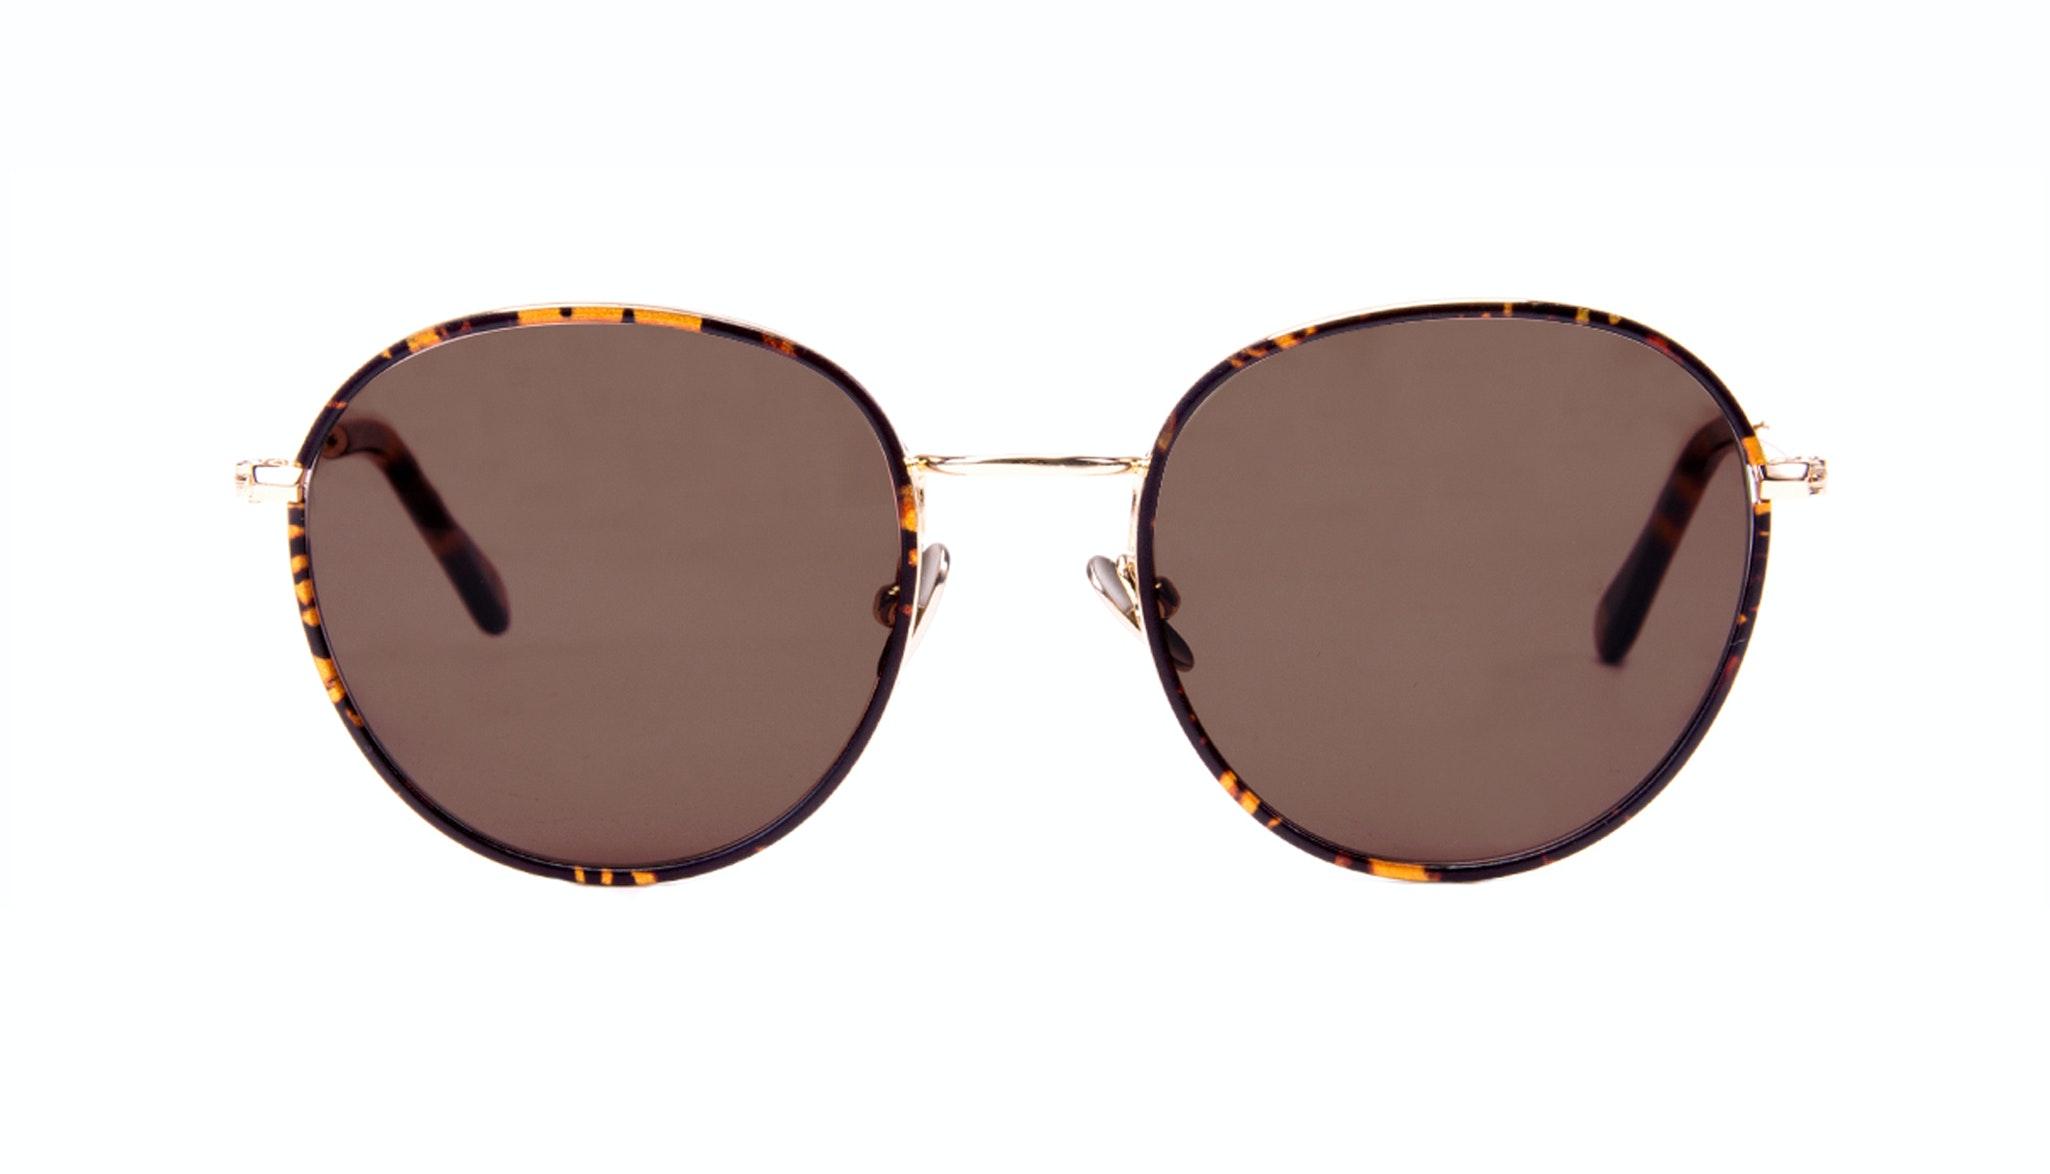 Affordable Fashion Glasses Aviator Round Sunglasses Women Subrosa Fauve Front